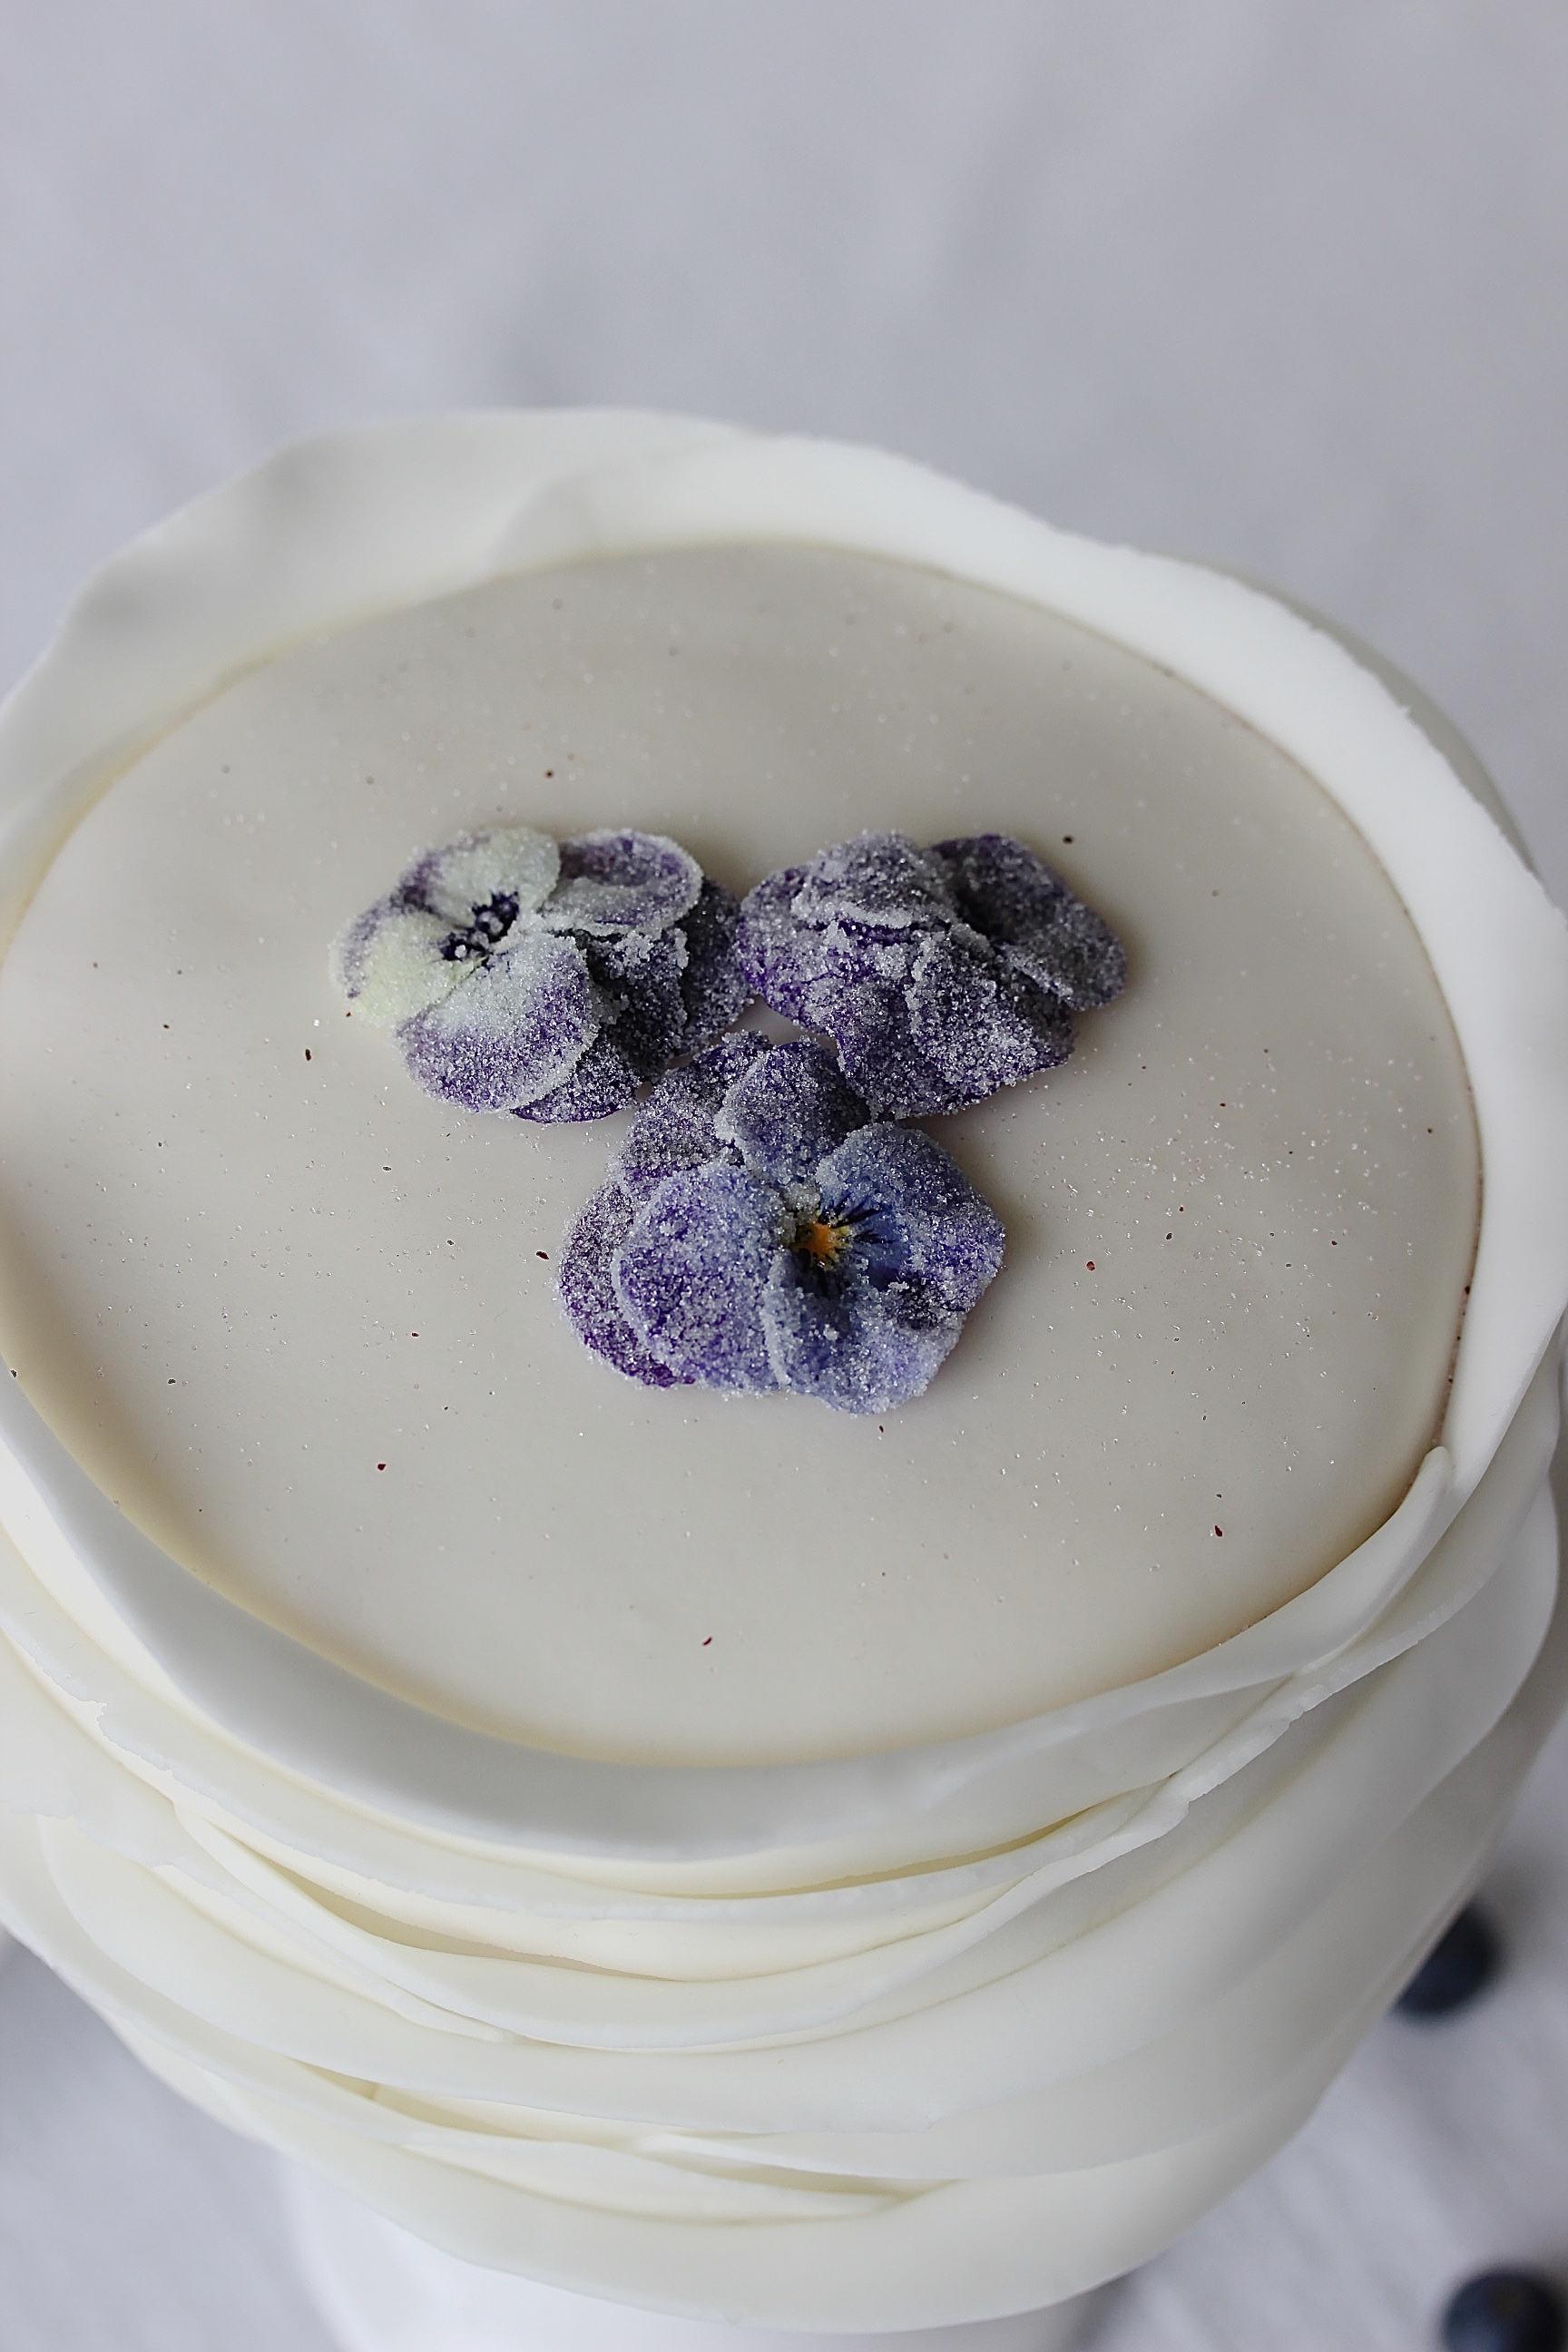 Muttertags Rezept: Blaubeer Fondant Torte mit gezuckerten Blüten backen Hornveilchen Motivtorte Hochzeitstorte weiße Torte #fondant #muttertag #hochzeit #cake #backen   Emma´s Lieblingsstücke